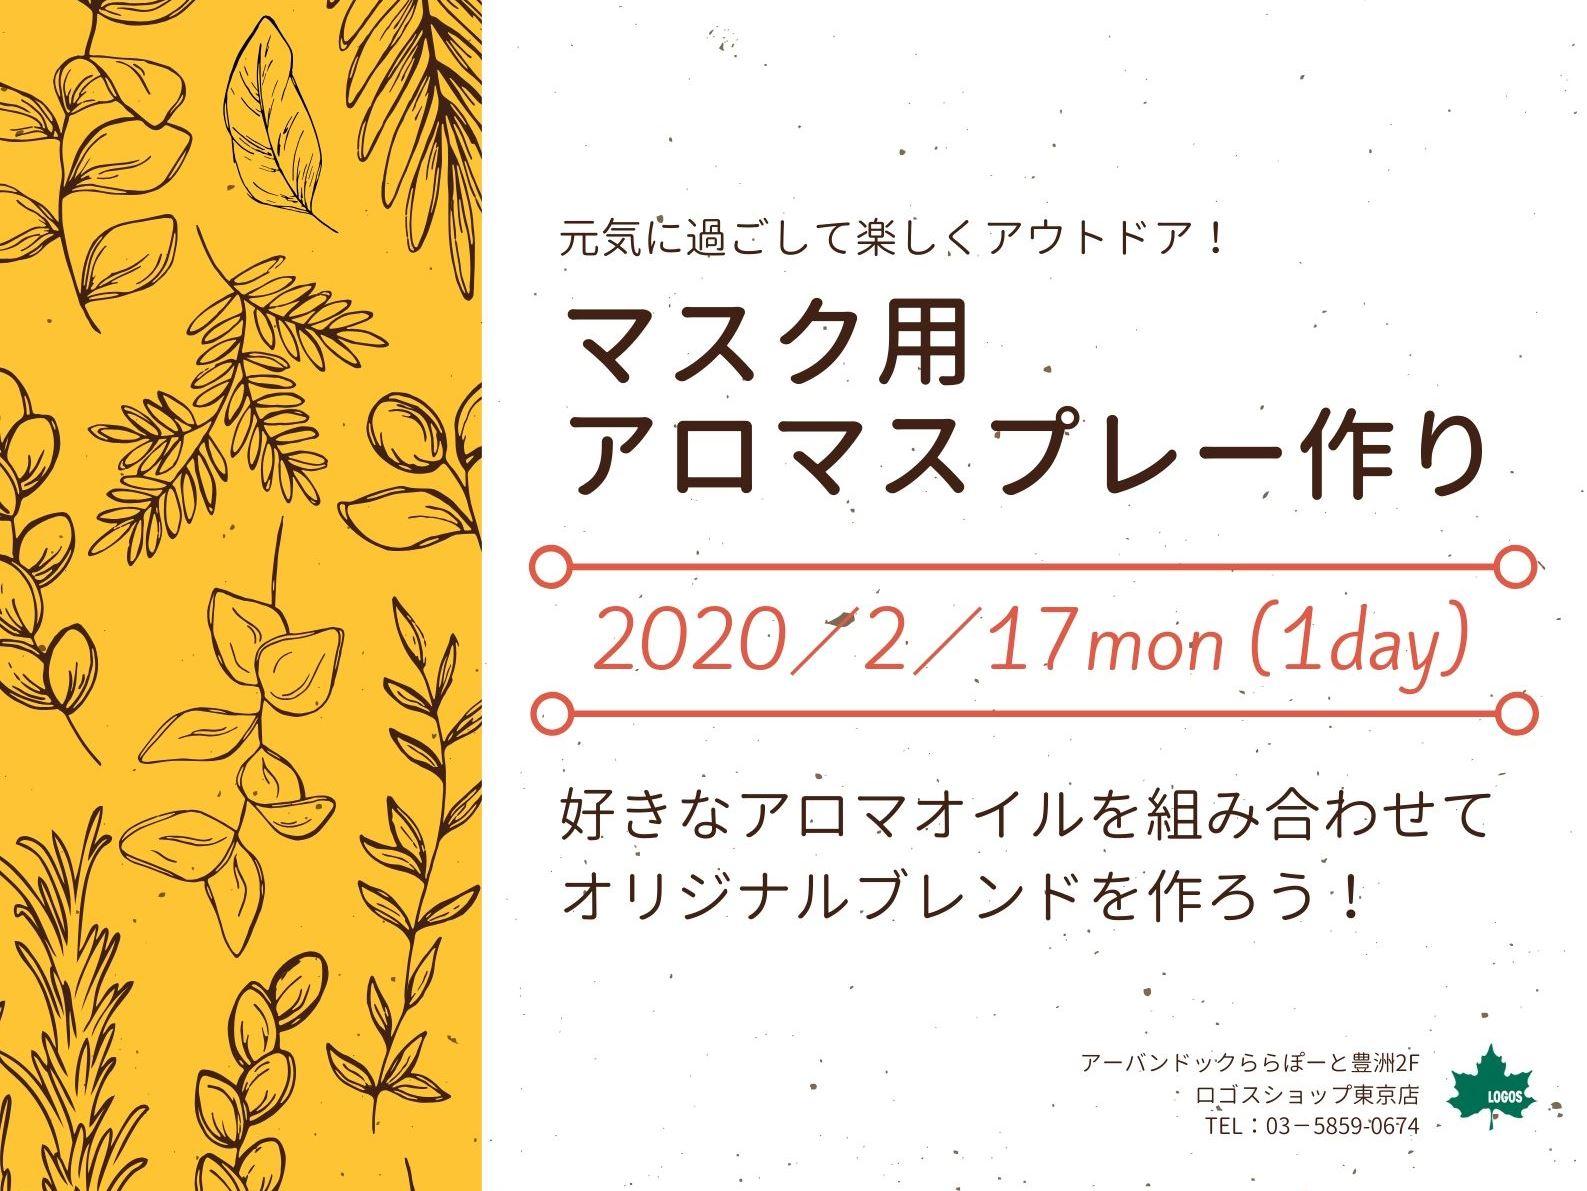 【LOGOS SHOP東京店】マスク用アロマスプレー作り